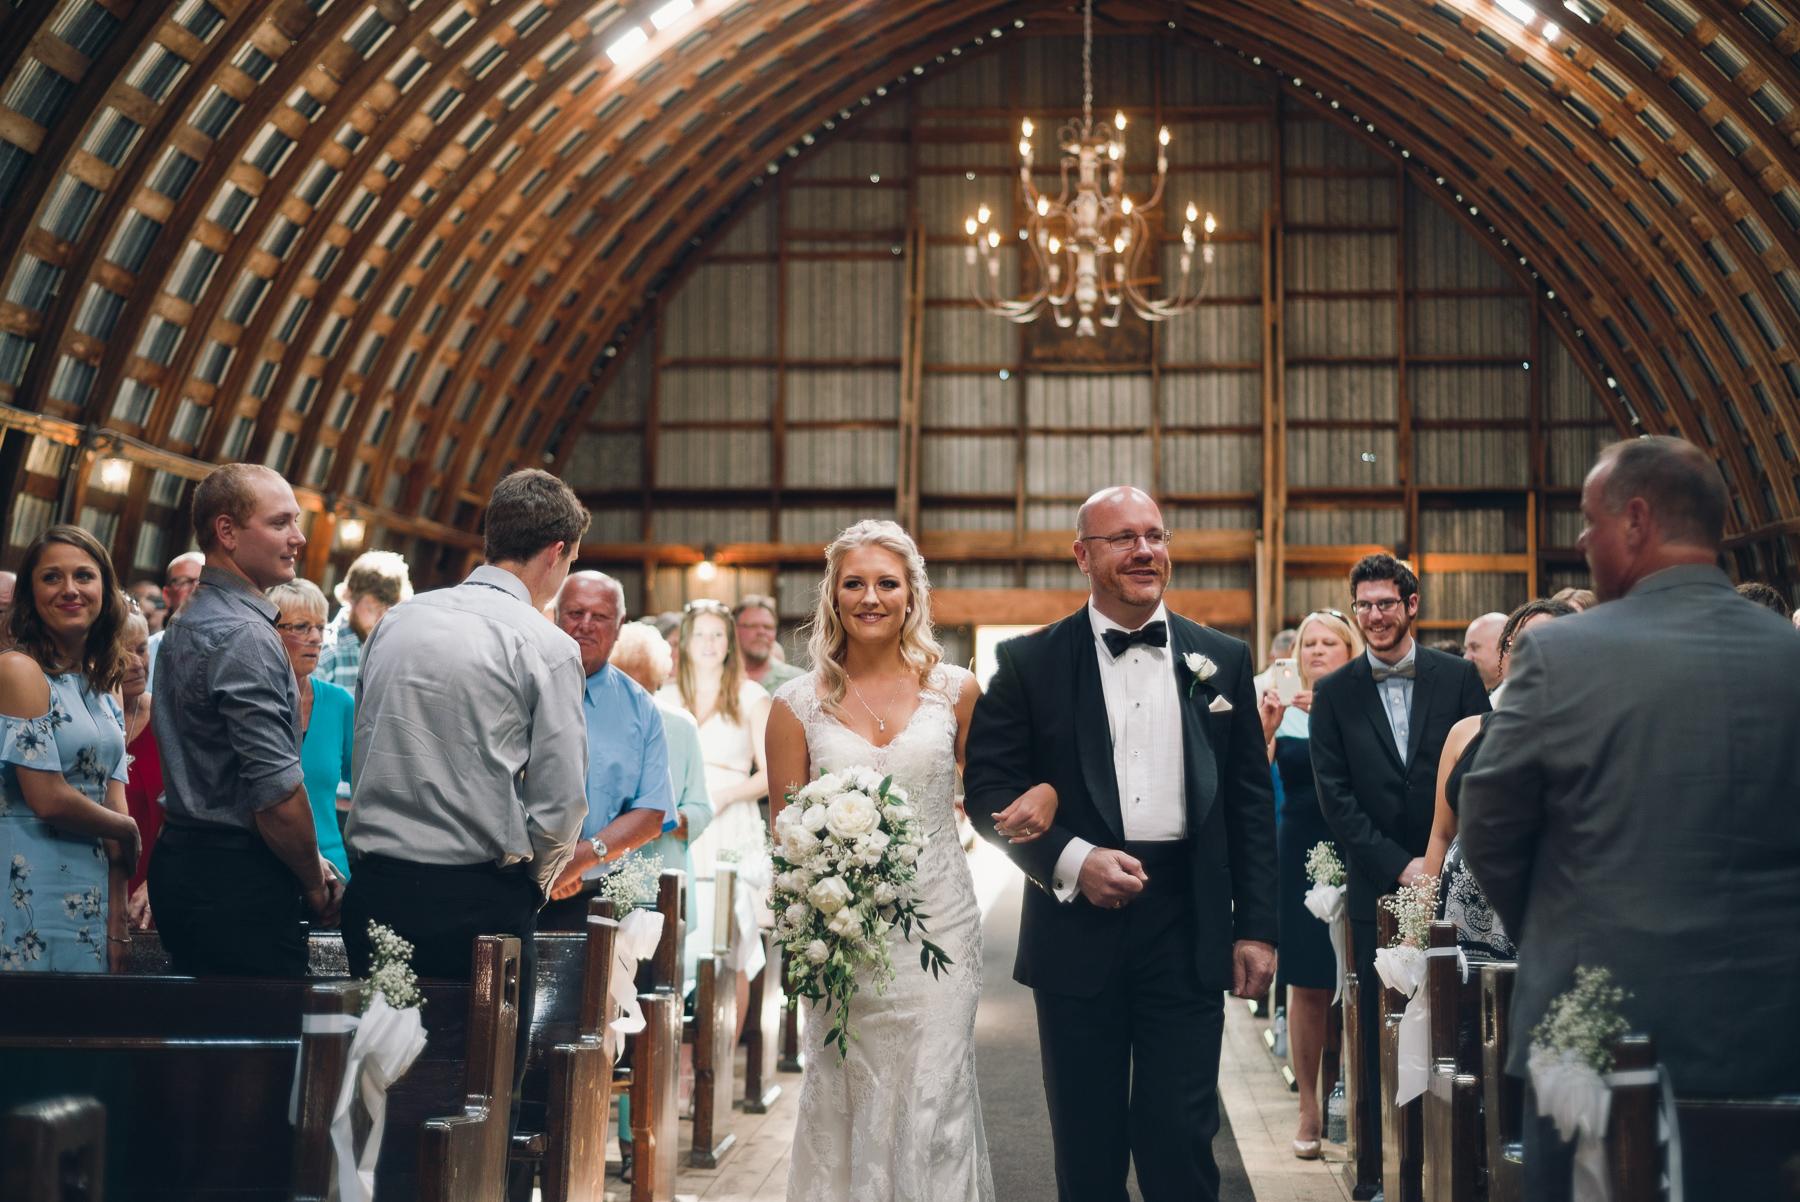 Kingston Wedding_Alabaster Jar Photography (25 of 42).jpg